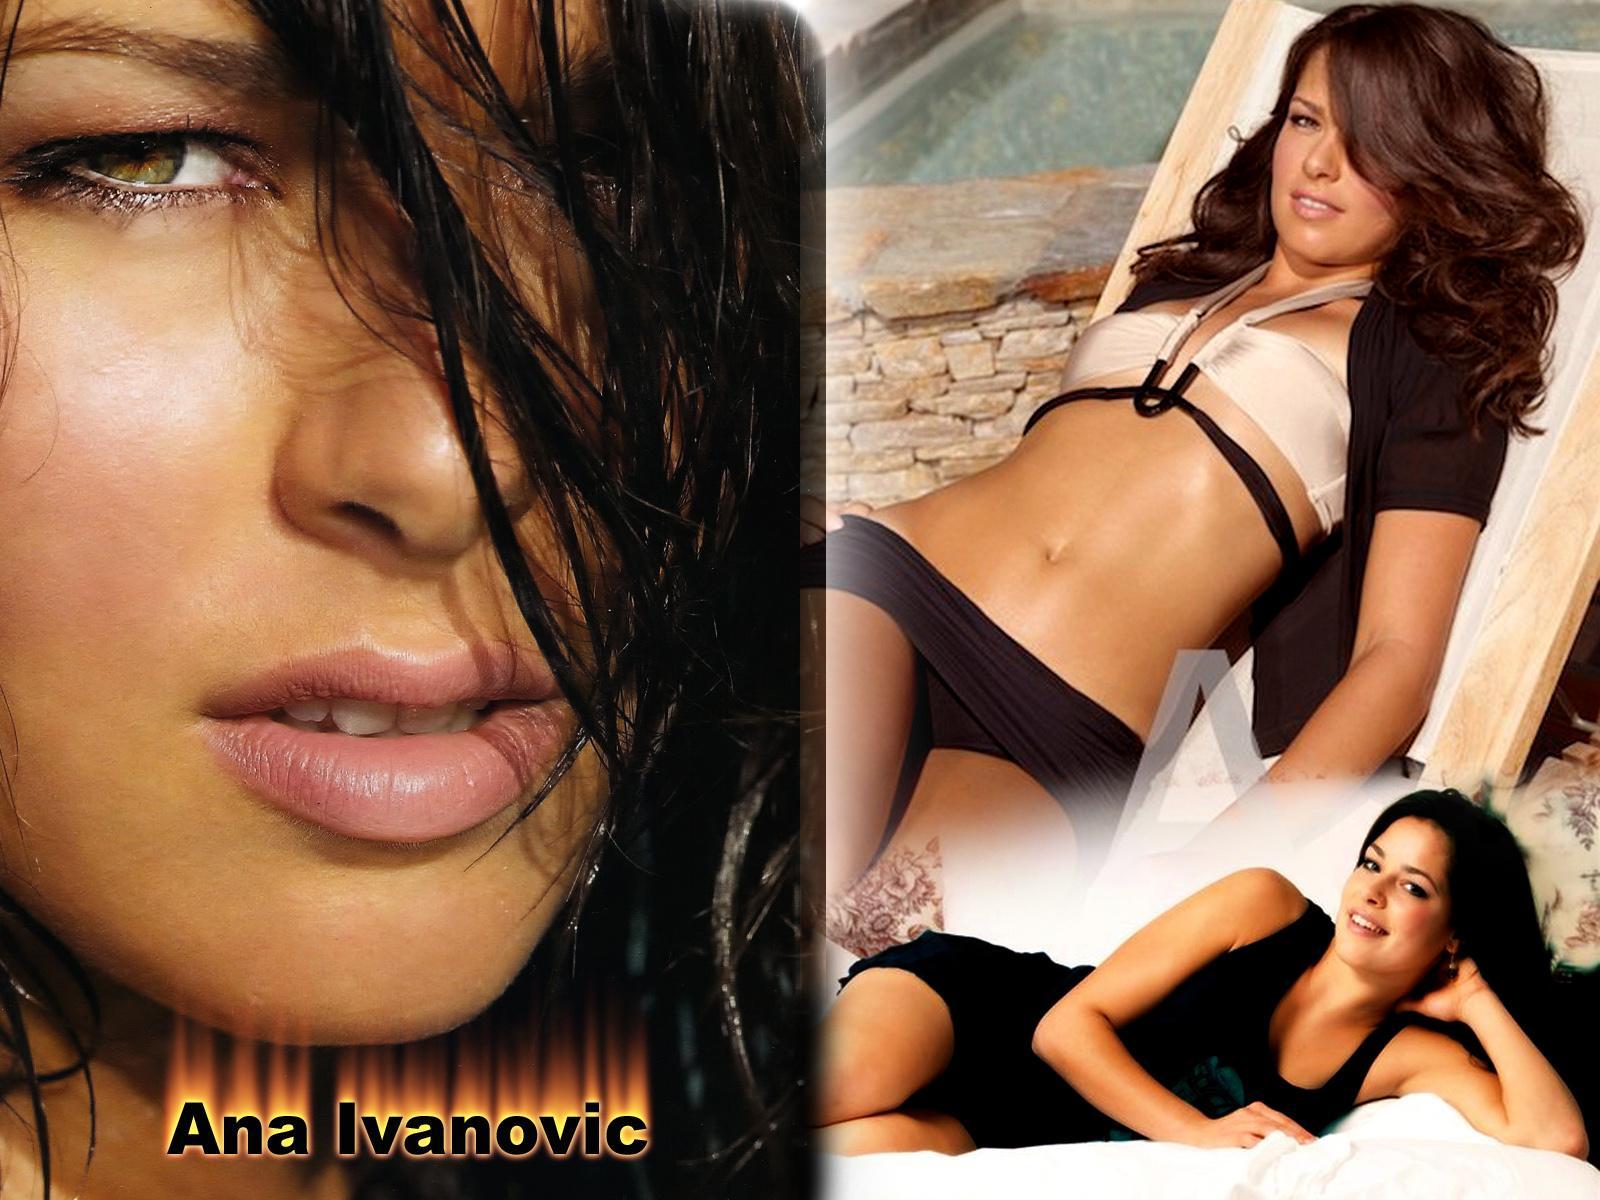 http://1.bp.blogspot.com/_CtbLuspRpUs/TMbUY9UVtUI/AAAAAAAA3iY/d4EZBdkk8hA/s1600/Ana%2BIvanovic%2BWallpaper%2B01.JPG